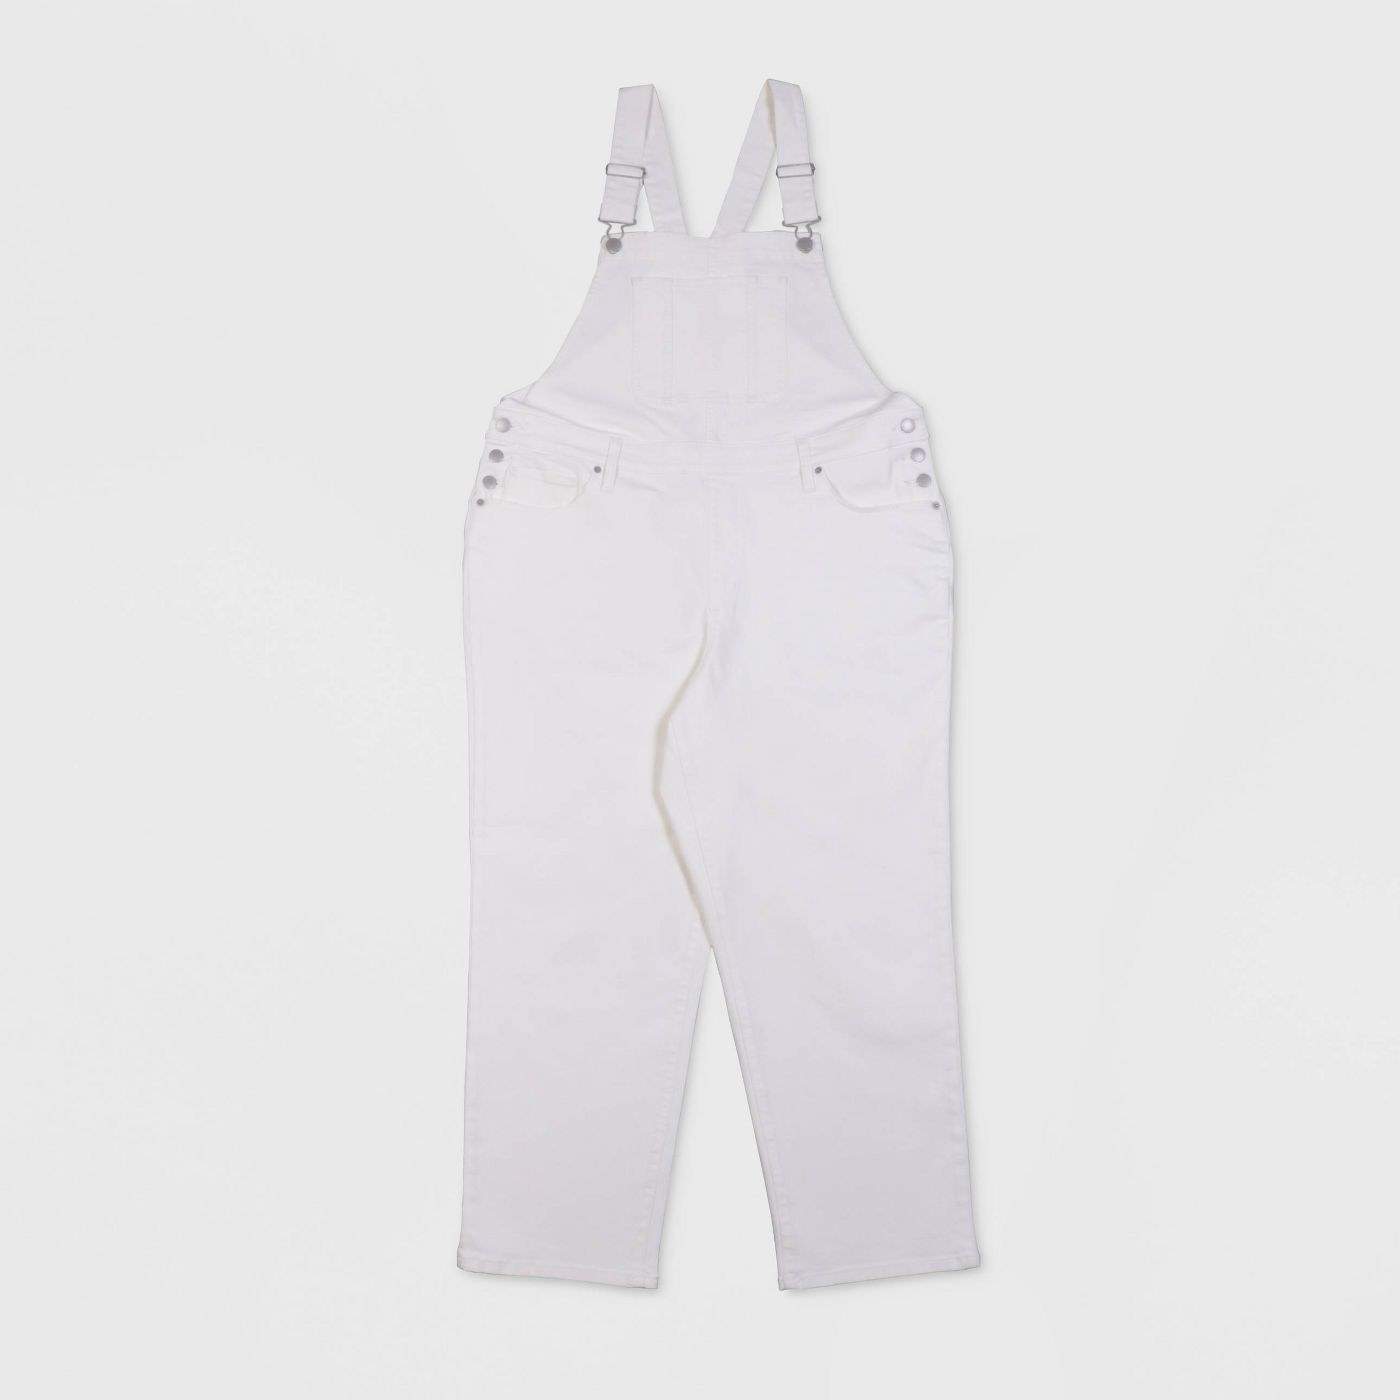 The white overalls